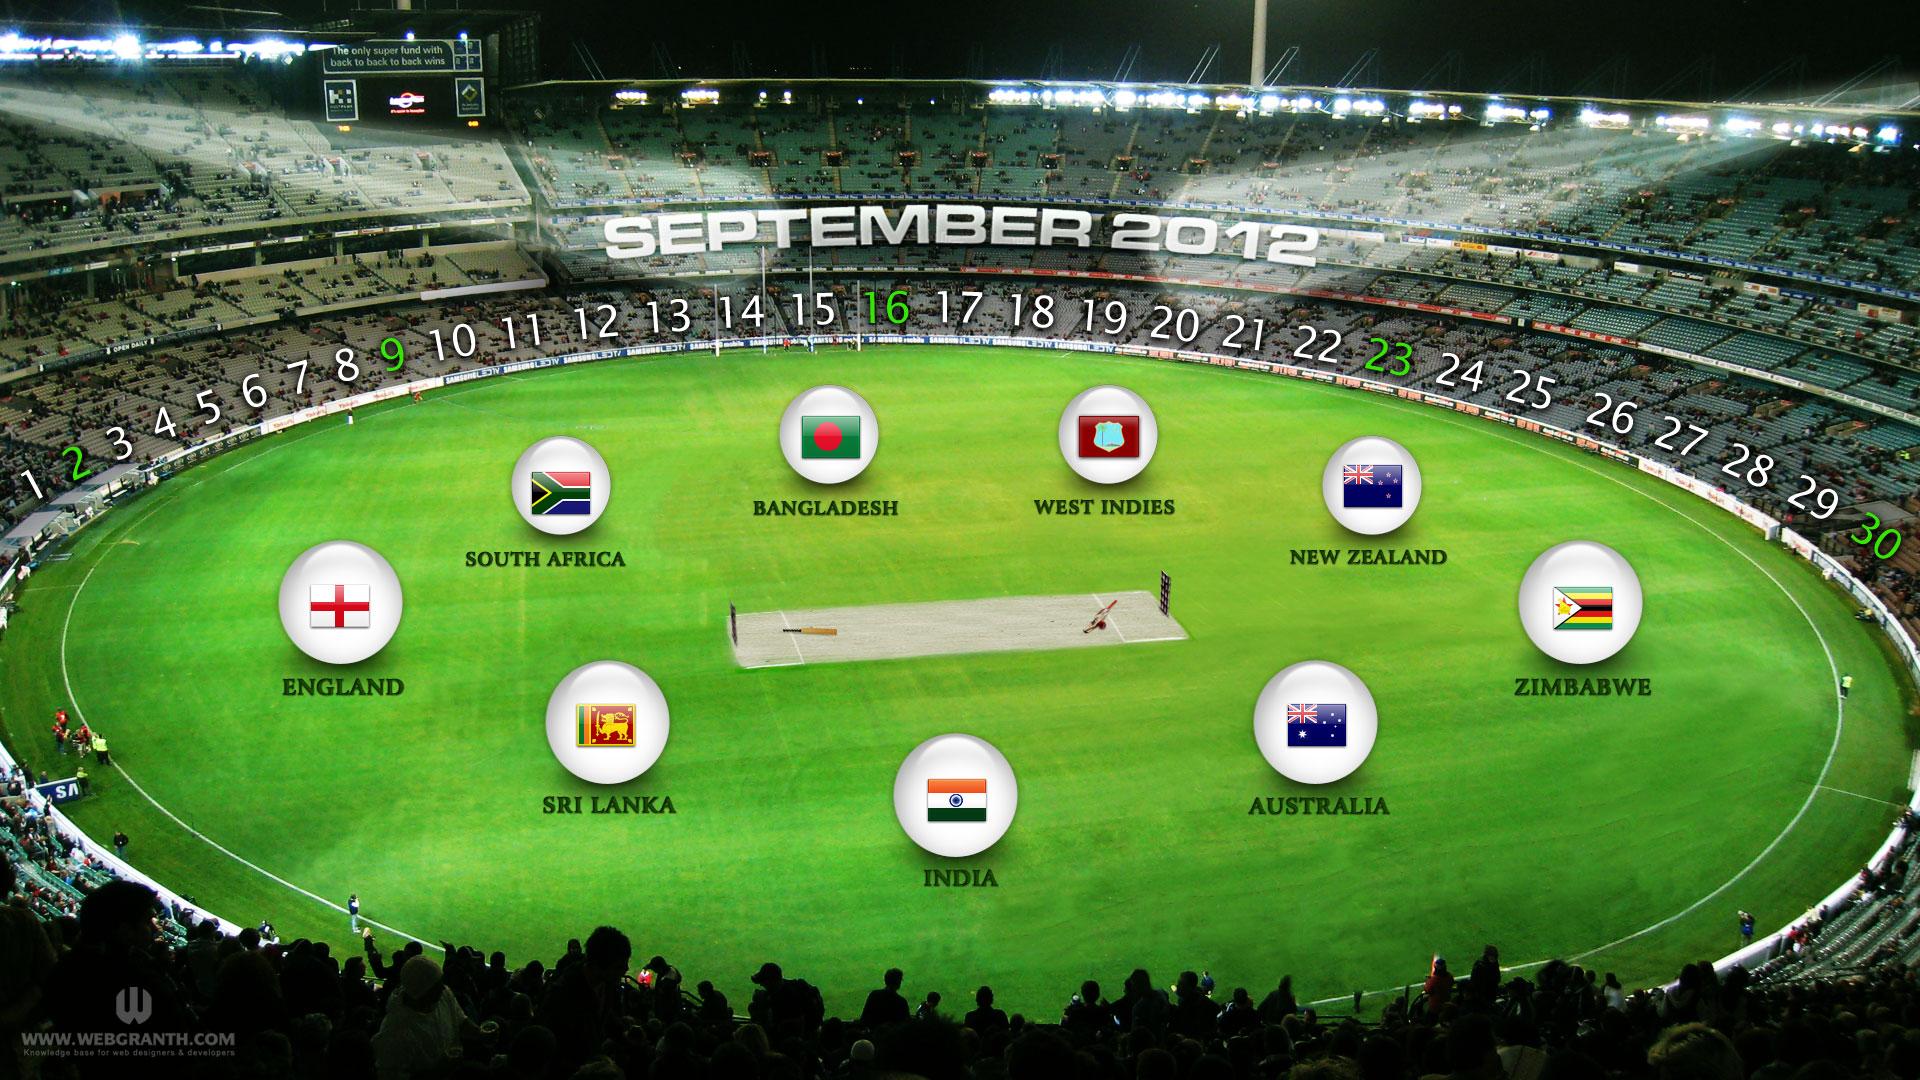 T20 World Cup Wallpaper - World Cup , HD Wallpaper & Backgrounds